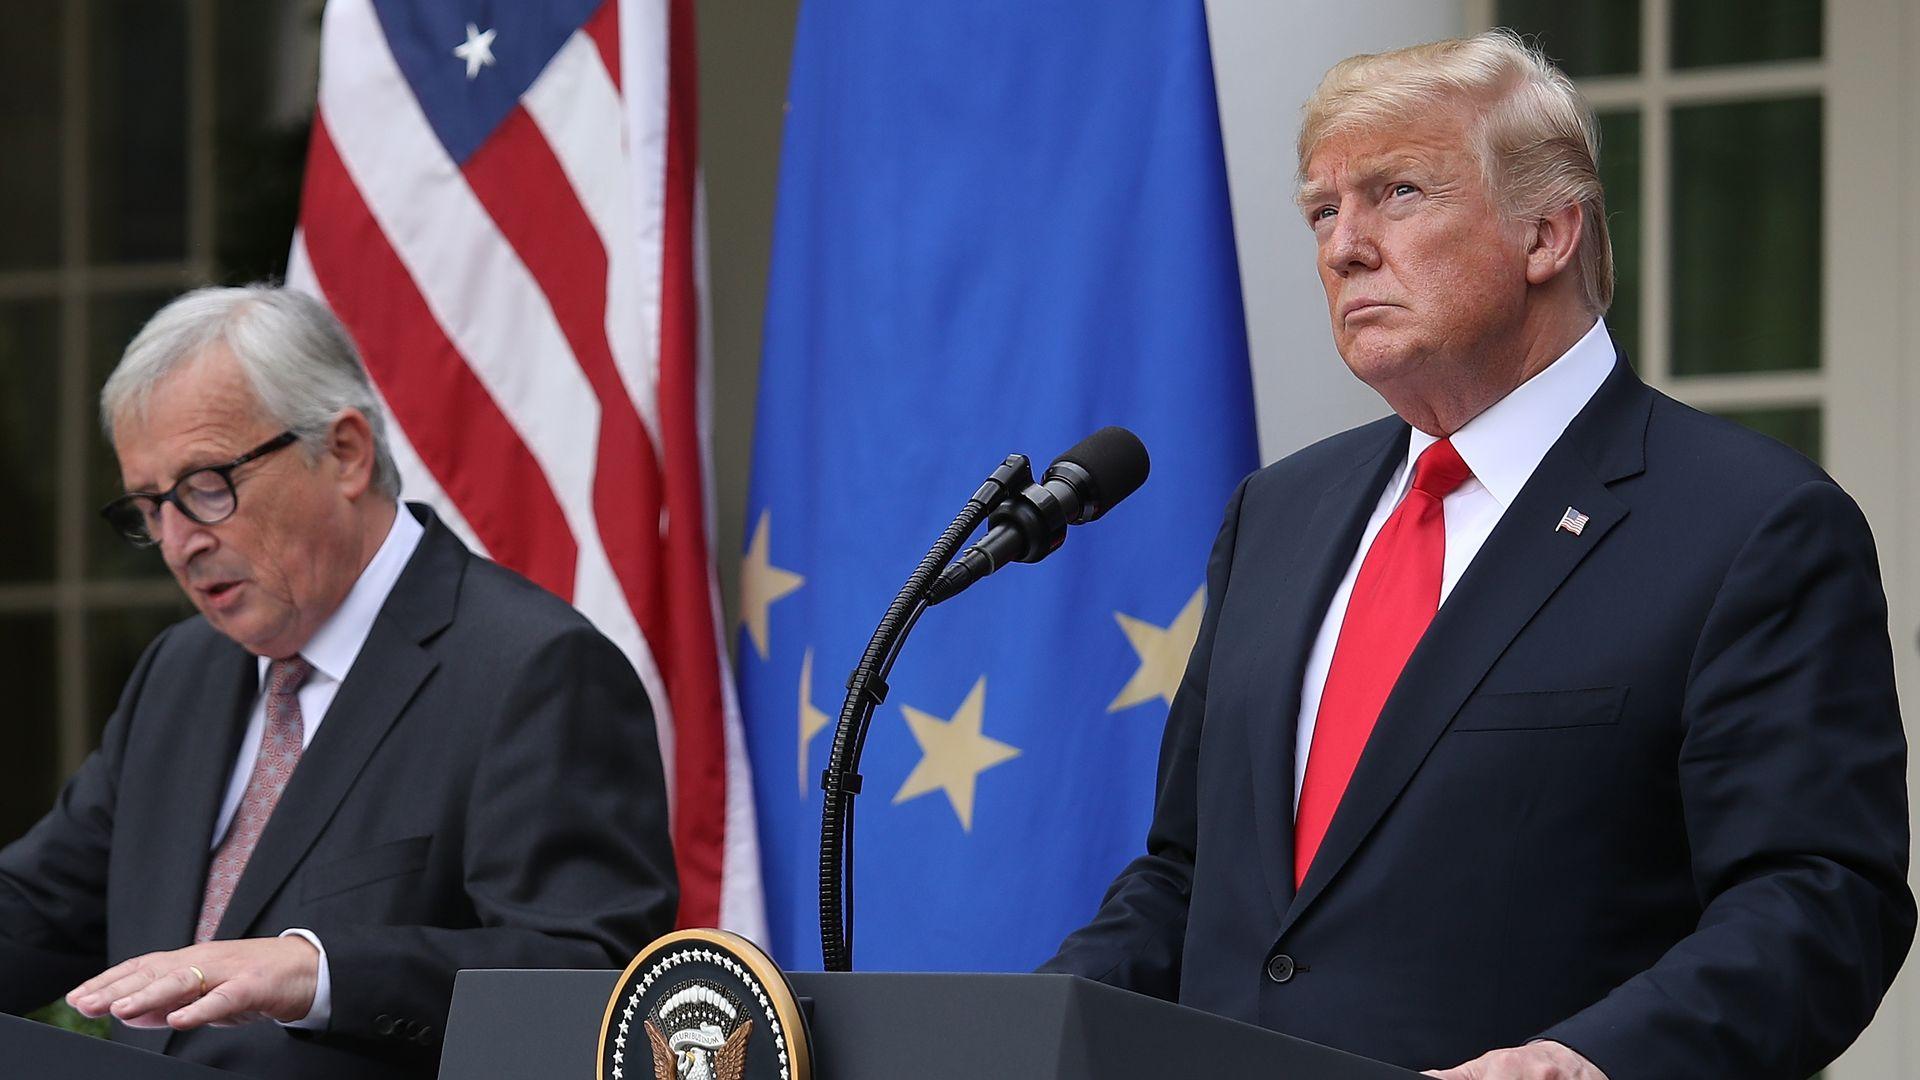 Trump's next battles on trade